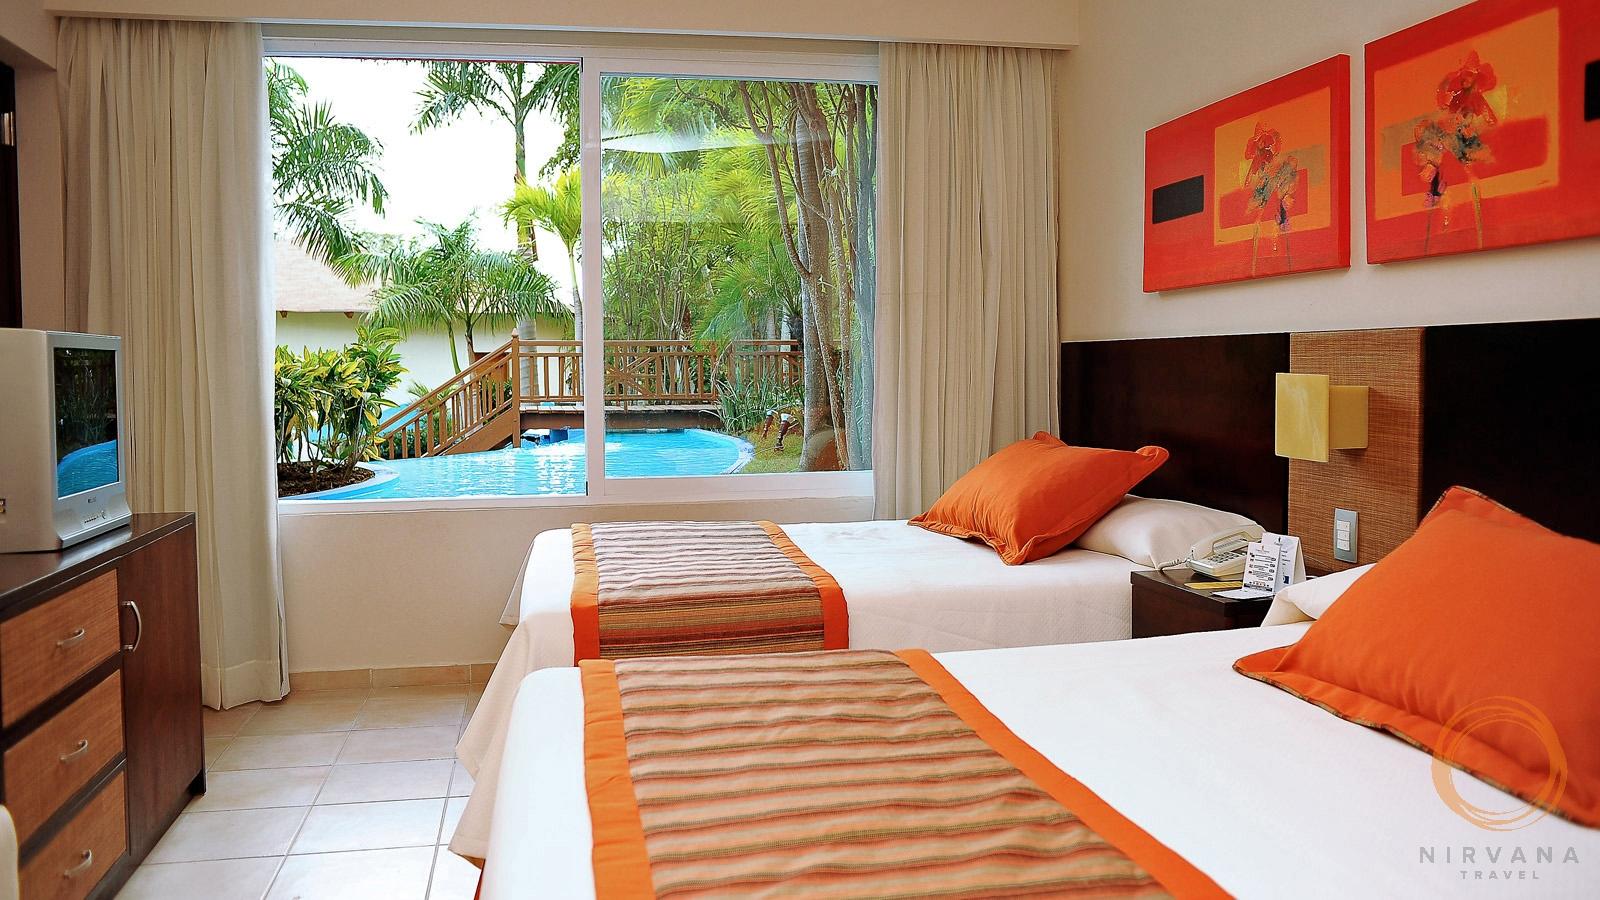 Tropical Princess Beach Resort  Spa   NirvanaTravelcz